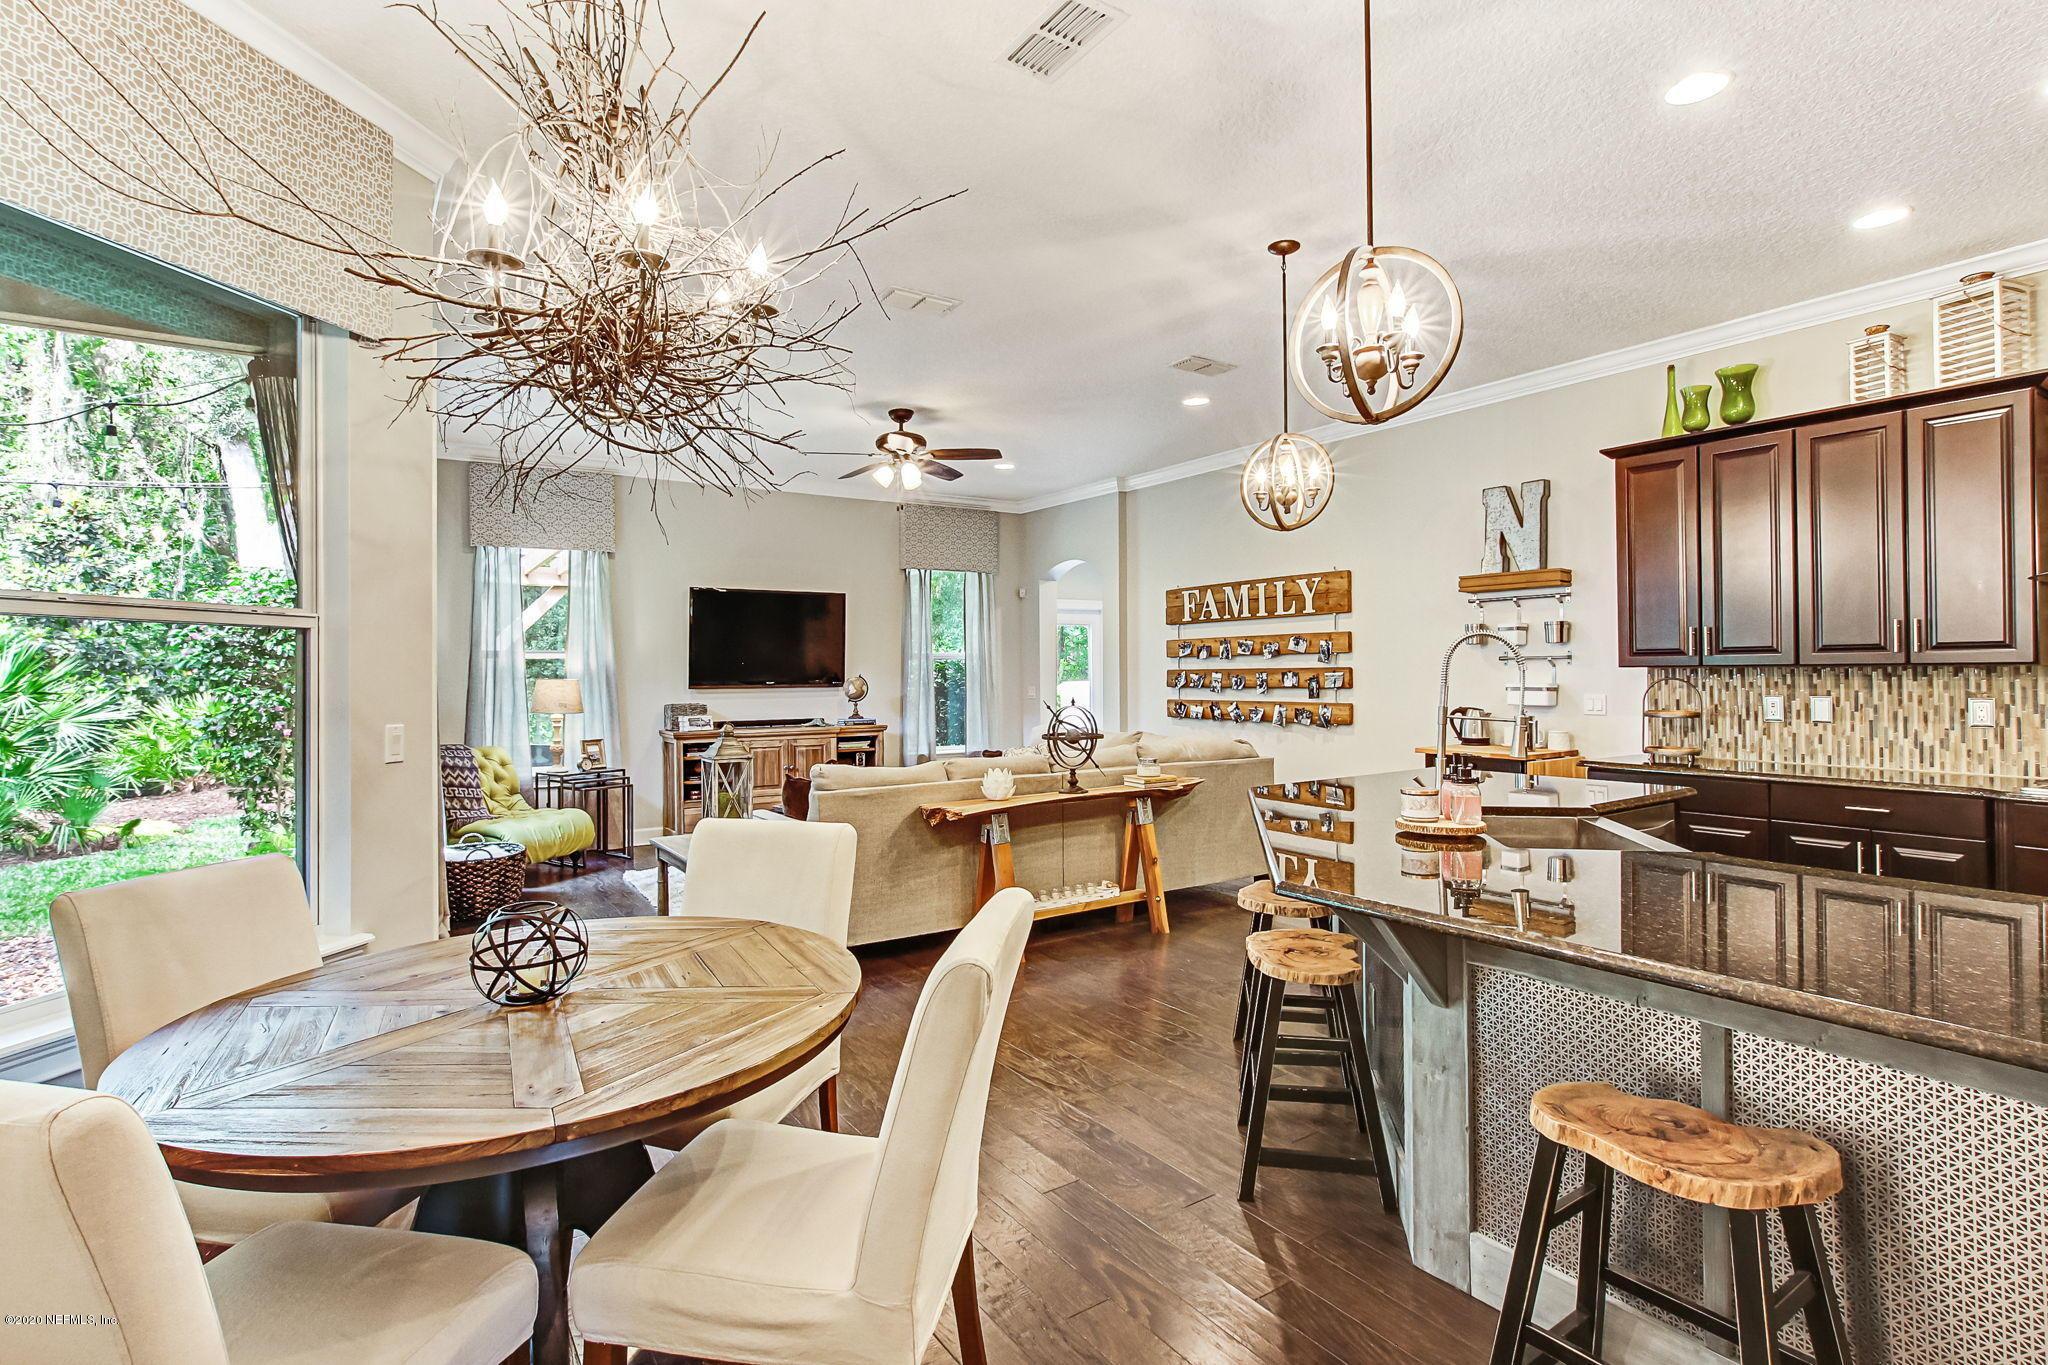 4834 BOAT LANDING, ST AUGUSTINE, FLORIDA 32092, 4 Bedrooms Bedrooms, ,3 BathroomsBathrooms,Residential,For sale,BOAT LANDING,1053454